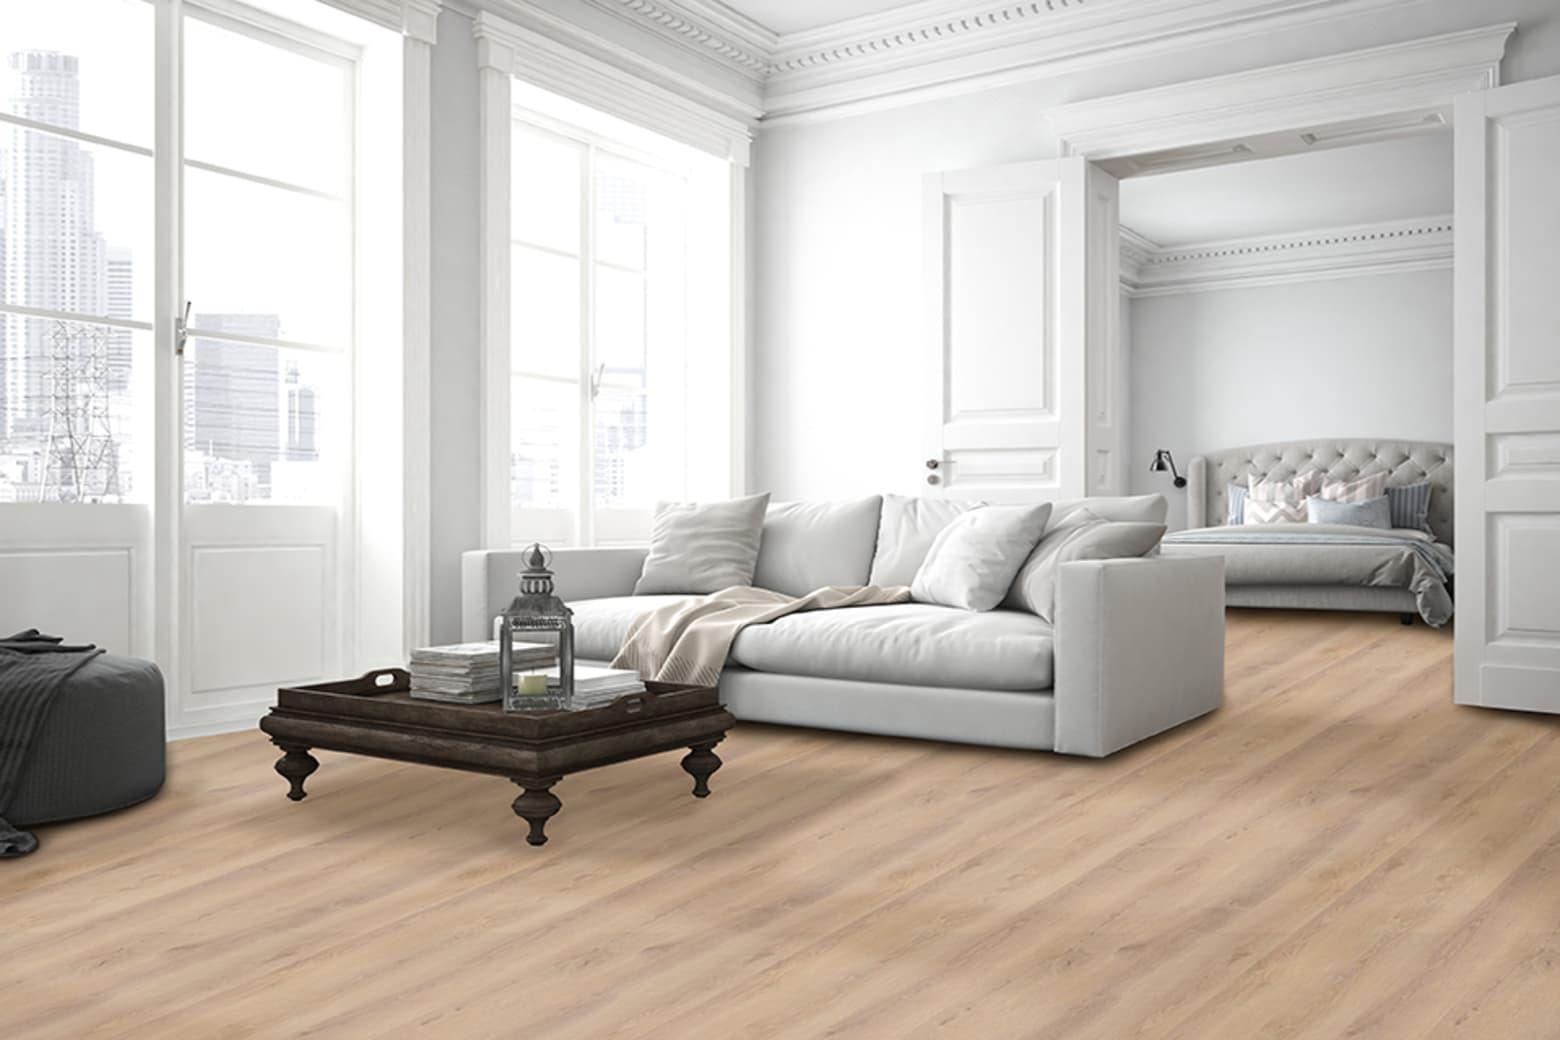 Luxury Click Vinyl Flooring Br White Oak 5mm By 169mm By 1210mm